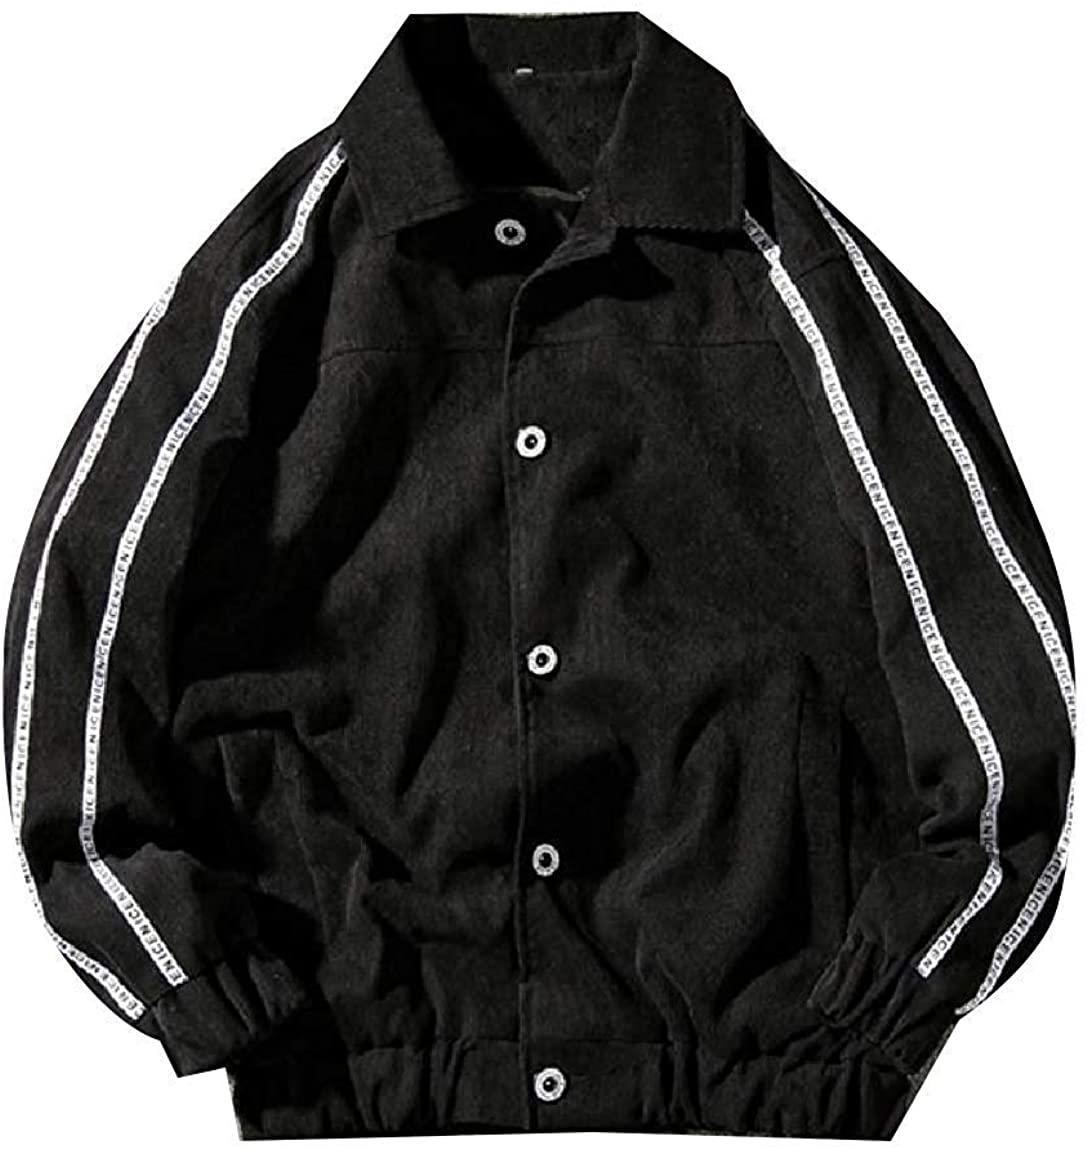 Men Simple Down Turn Buckle Slim Collar Warm Plus Size Outwear Jacket,Black,US M=China L